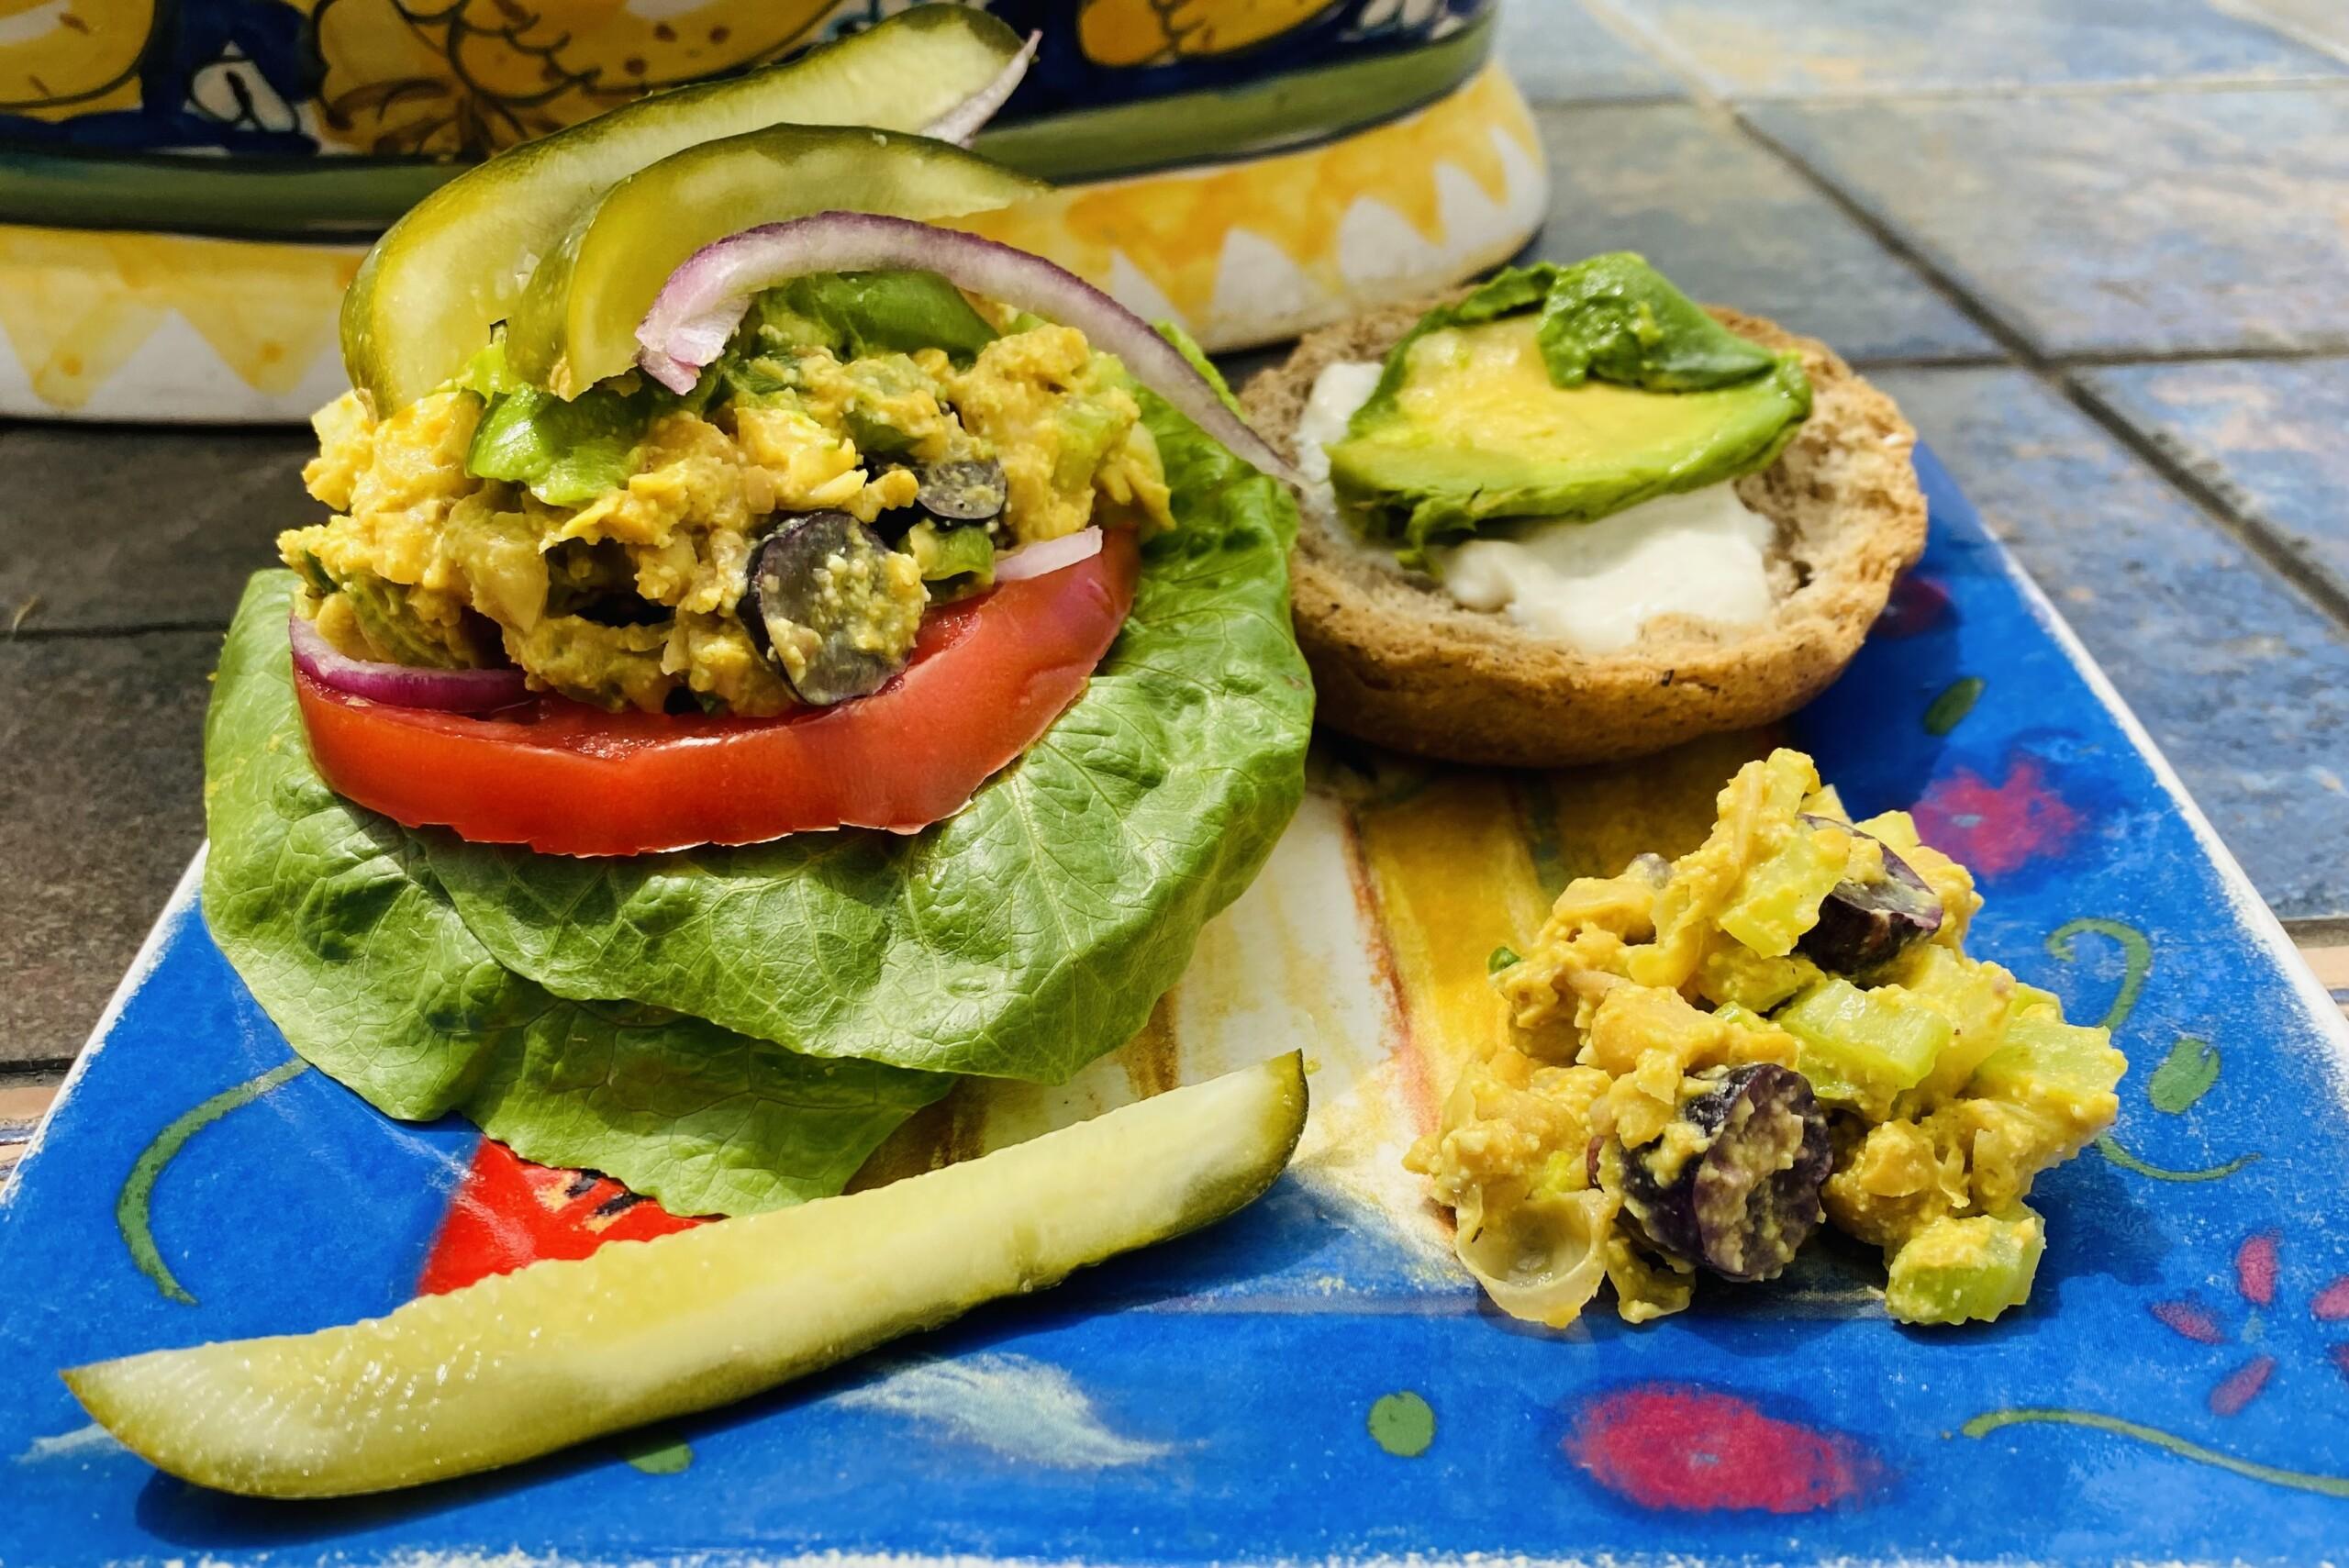 Vegan Curried Chickpea Salad